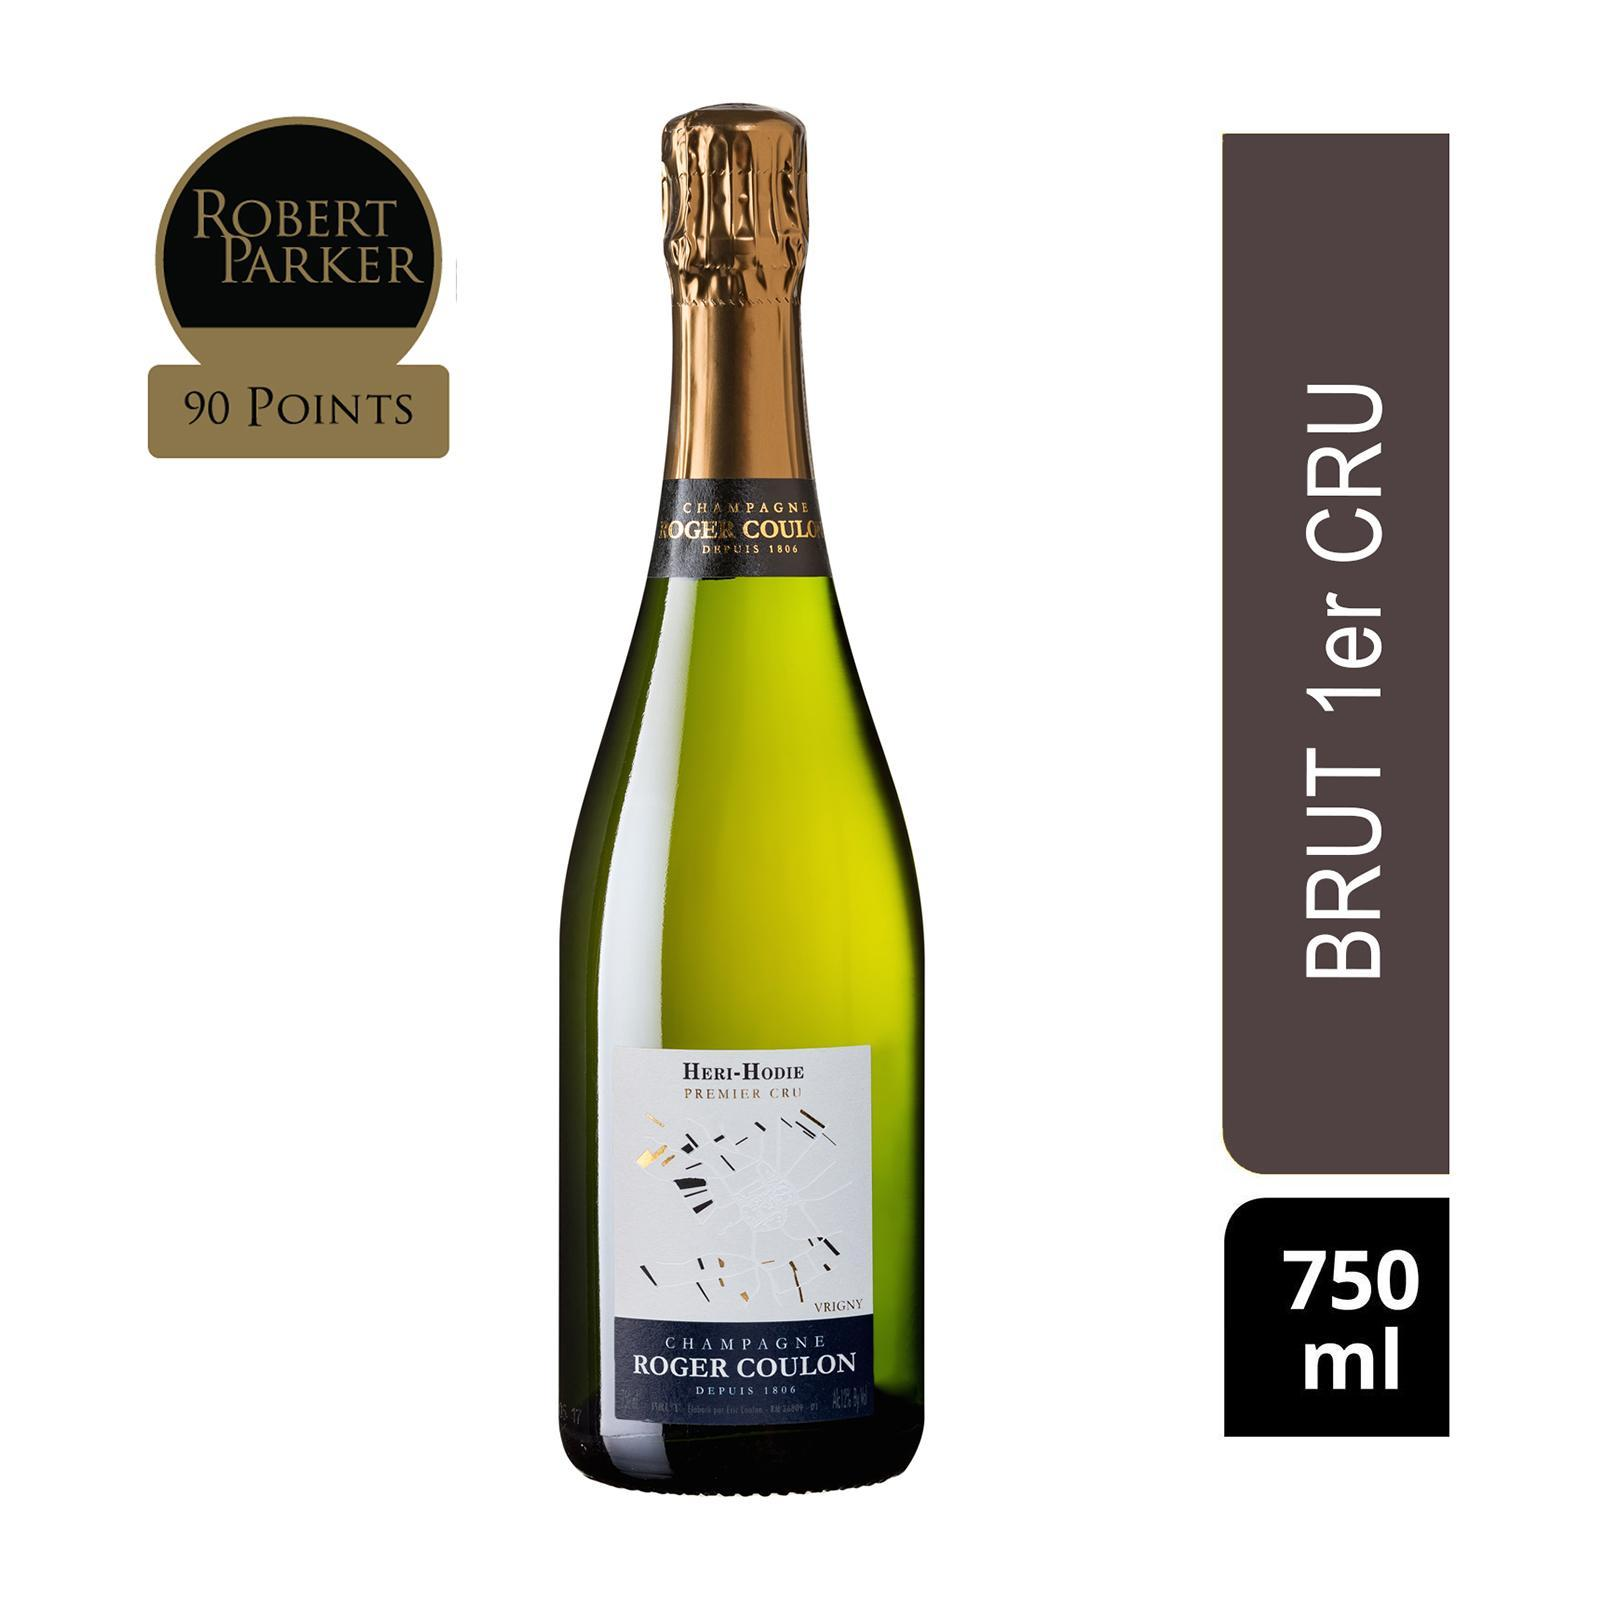 Roger Coulon Champagne Brut Roger Coulon - Cuvee Heri-Hodie 1Er Cru